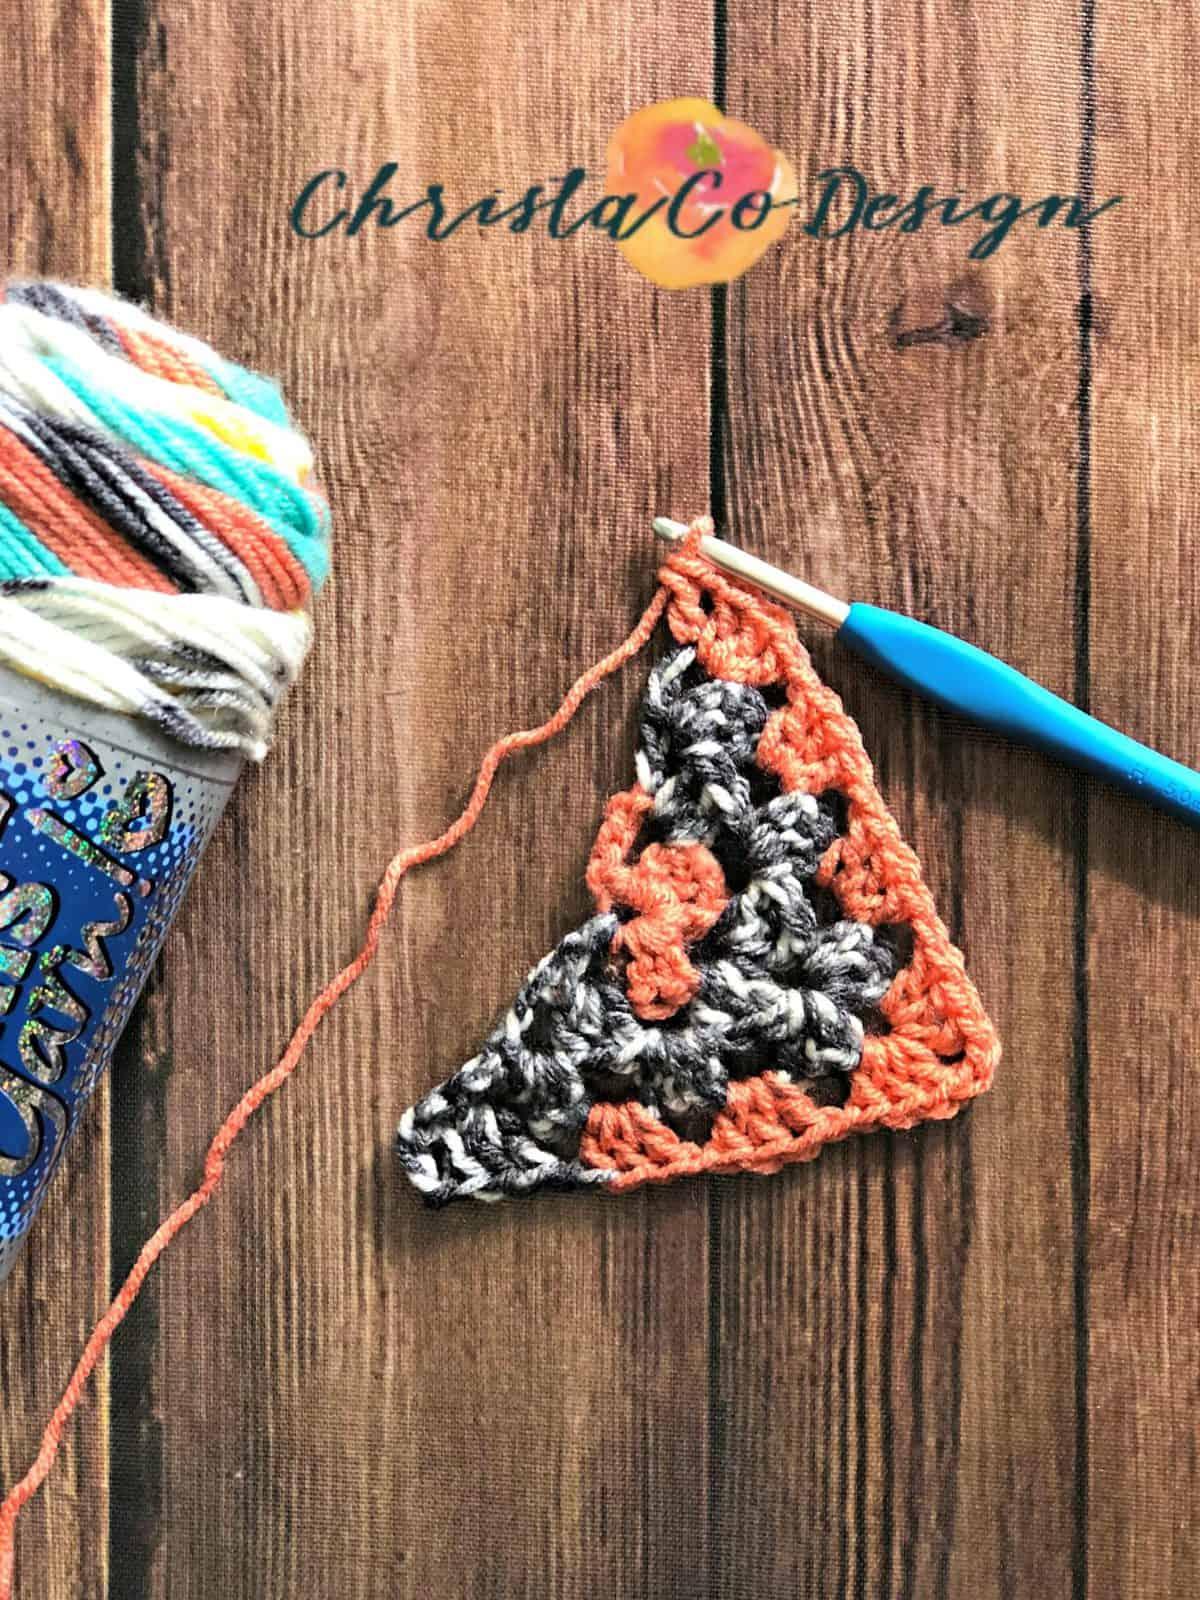 Through row 4 of triangle scarf crochet tutorial.